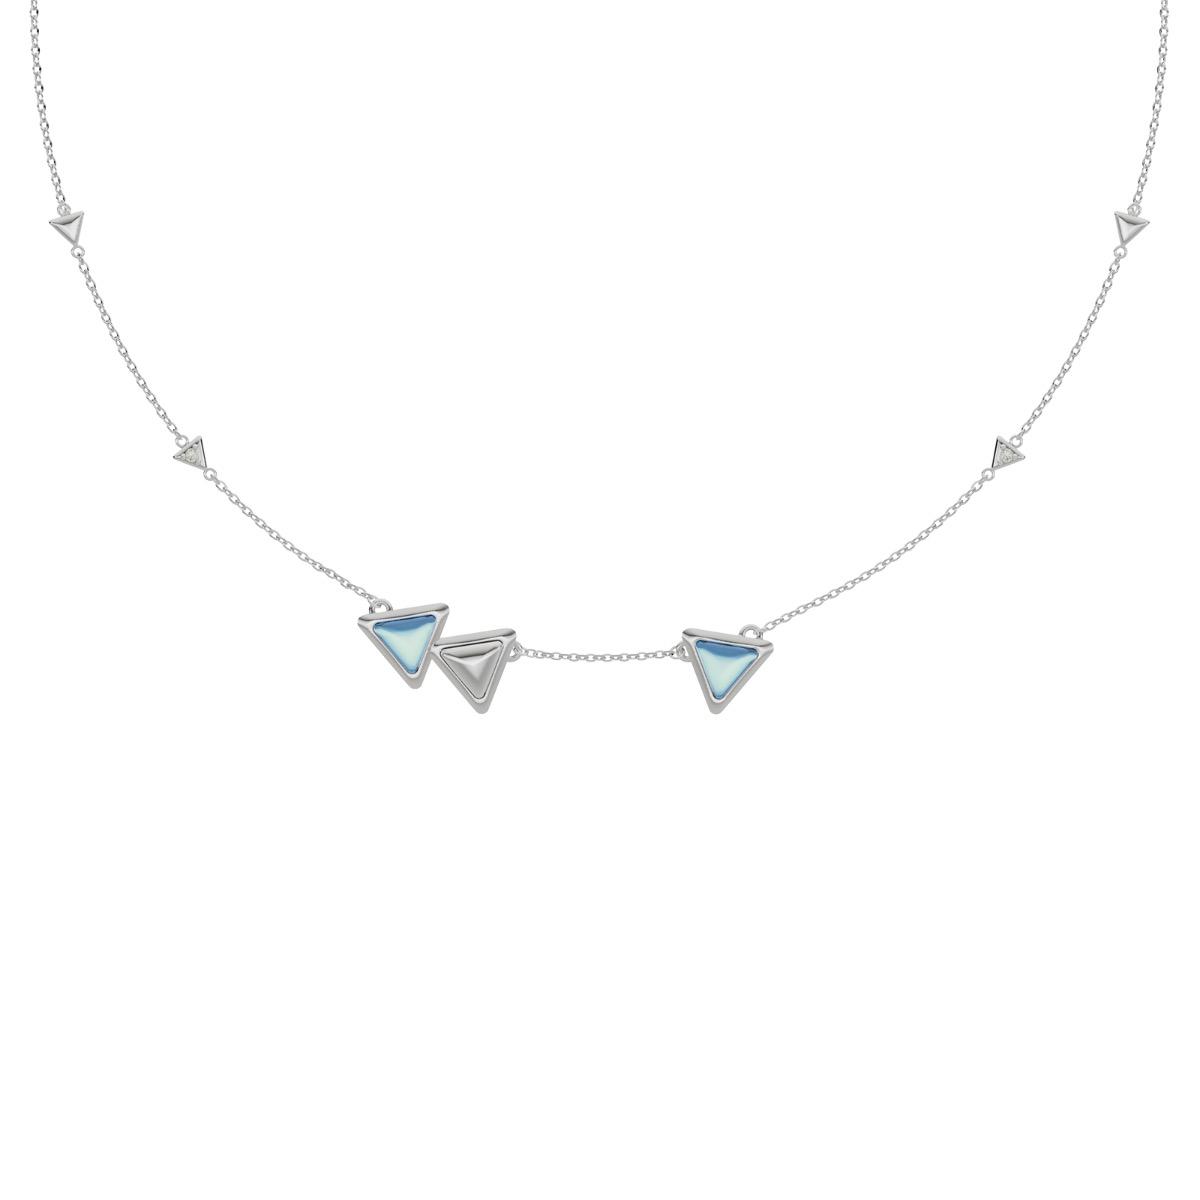 Necklace Dove Vai Rewind Gem White Gold Blue Topaz